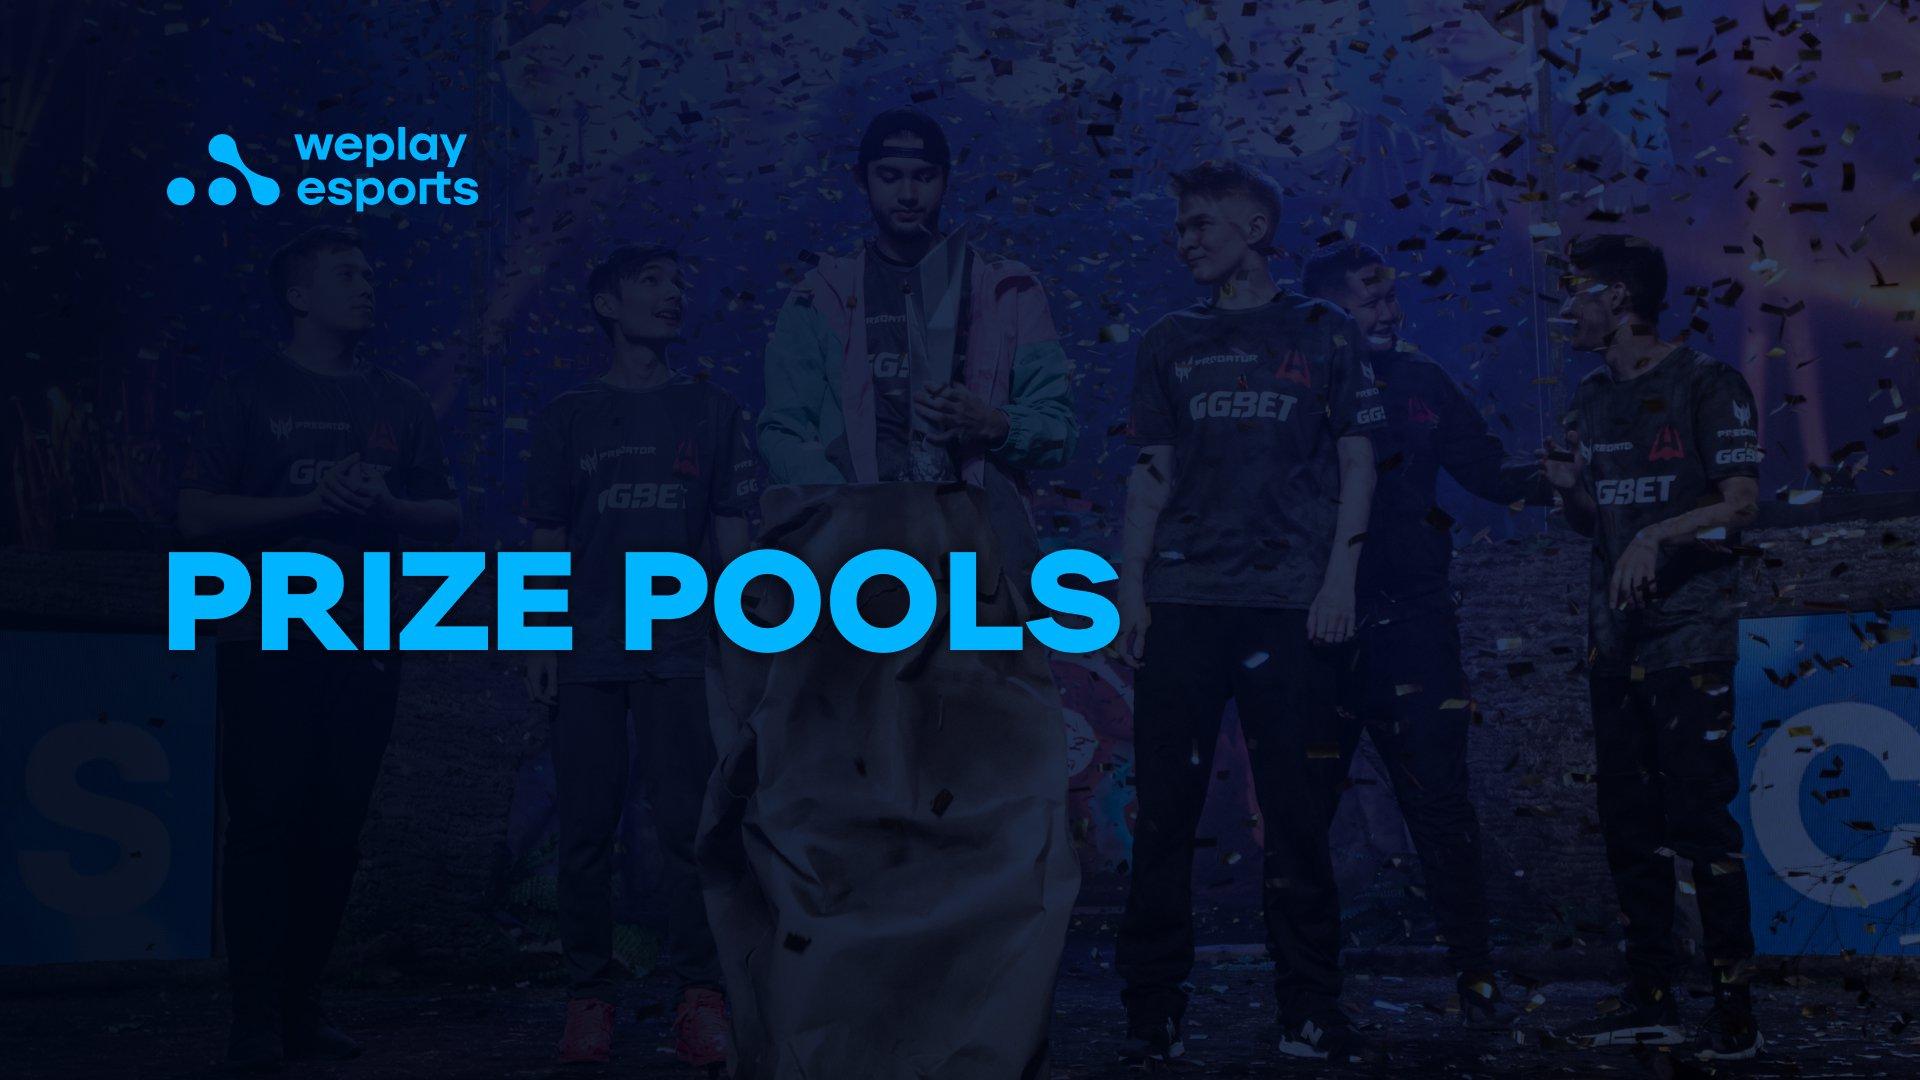 Prize pools